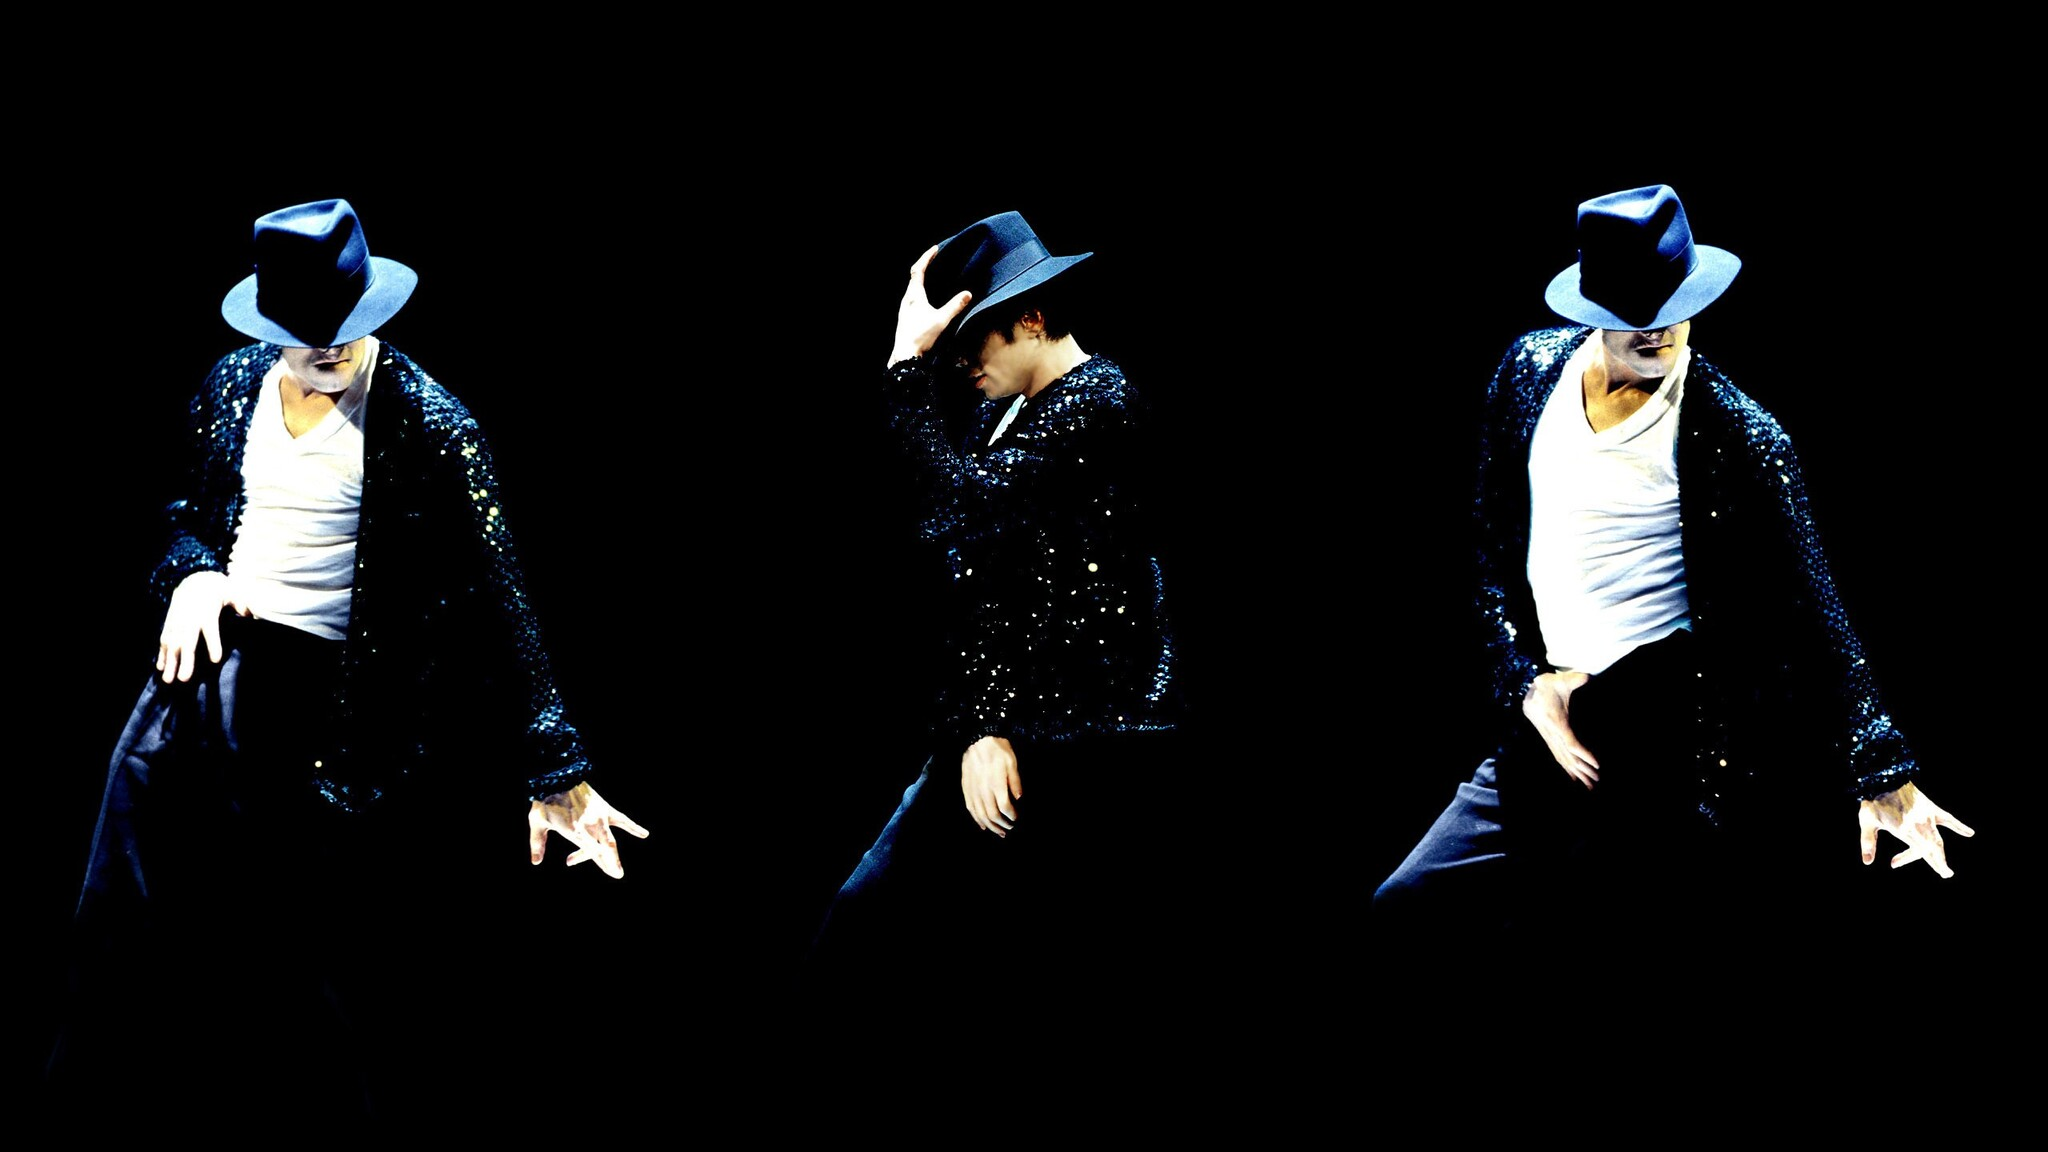 2048x1152 michael jackson doing dance 2048x1152 resolution hd 4k michael jackson doing danceg voltagebd Choice Image